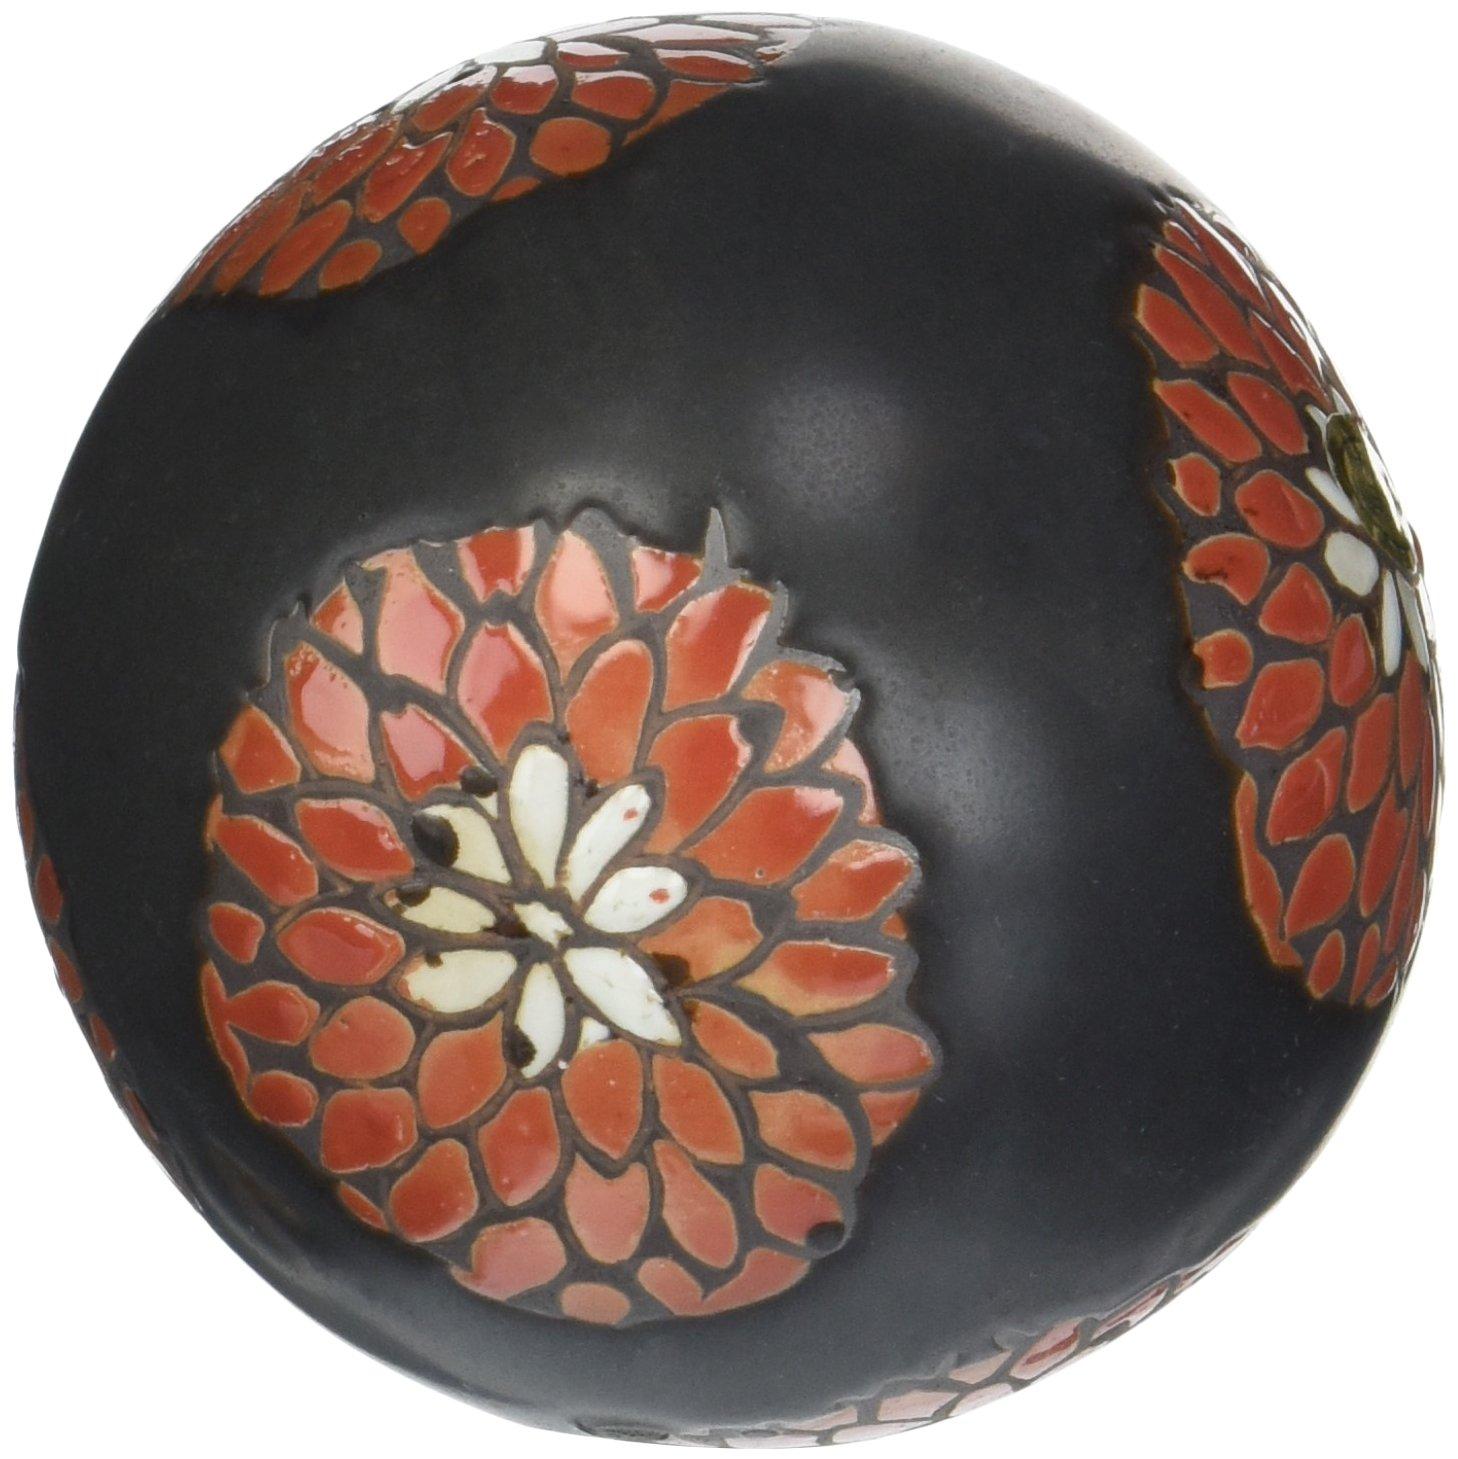 Red Flowers Black Porcelain Decorative Balls Set of 6 - ChristmasTablescapeDecor.com